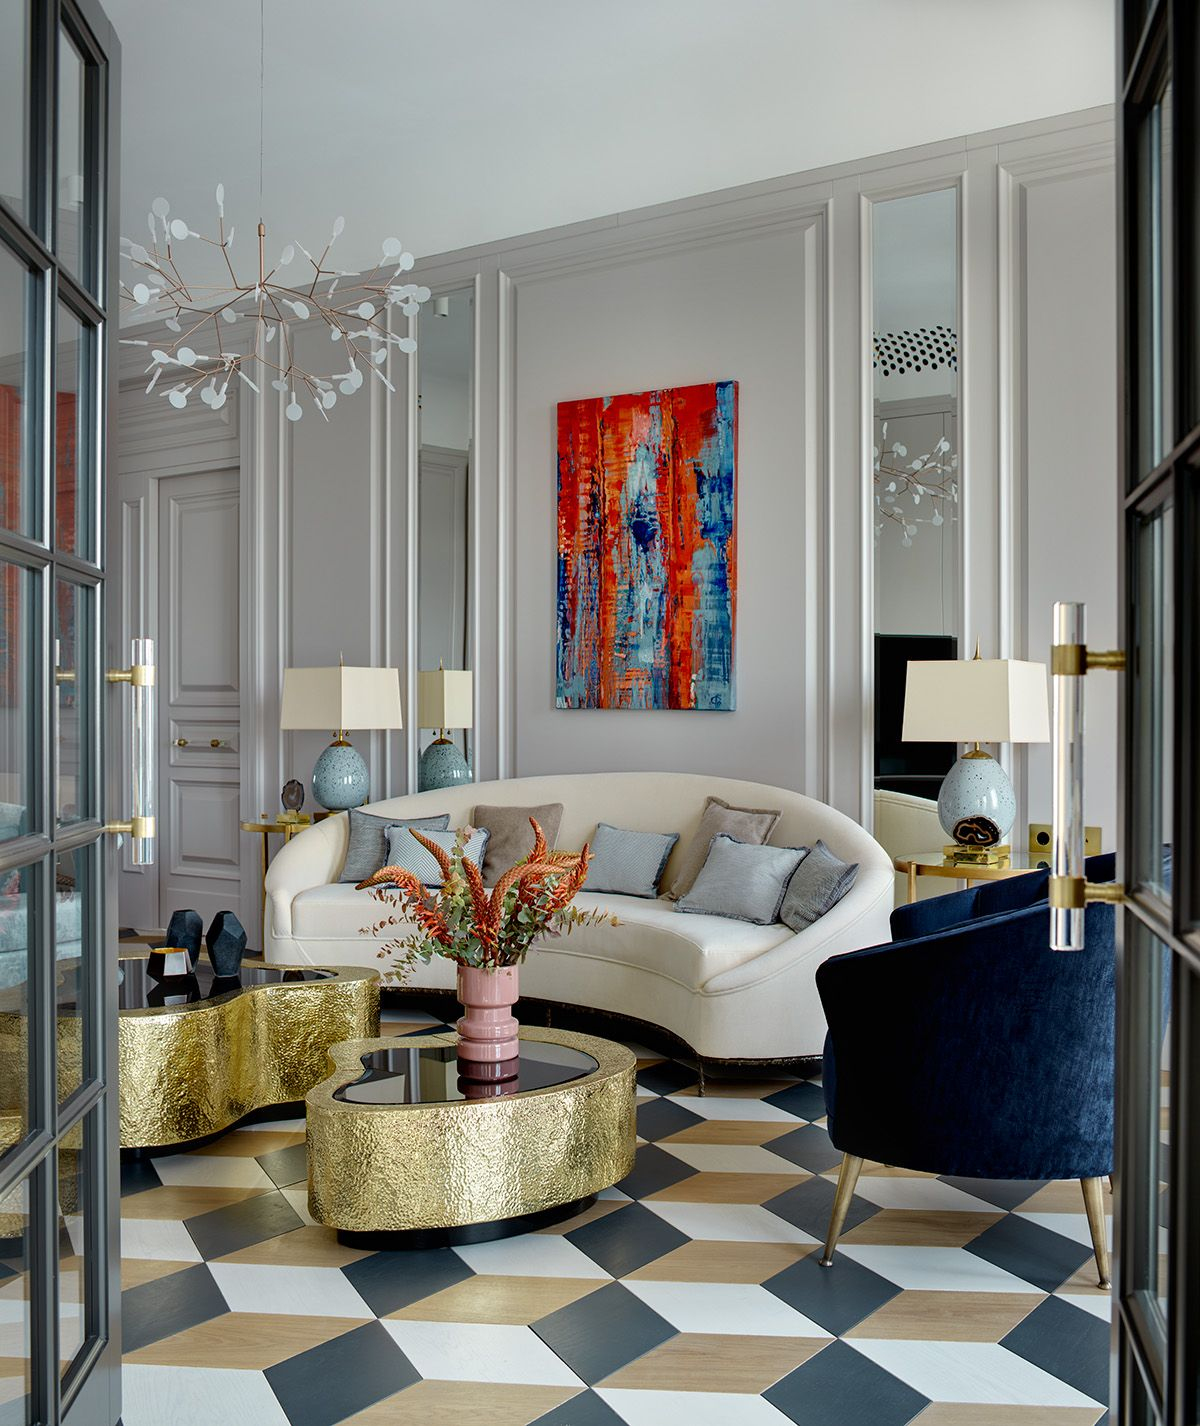 Get the best mid century home decor ideas delightfull visit for dining room modern inter  interior designers usa in also rh pinterest